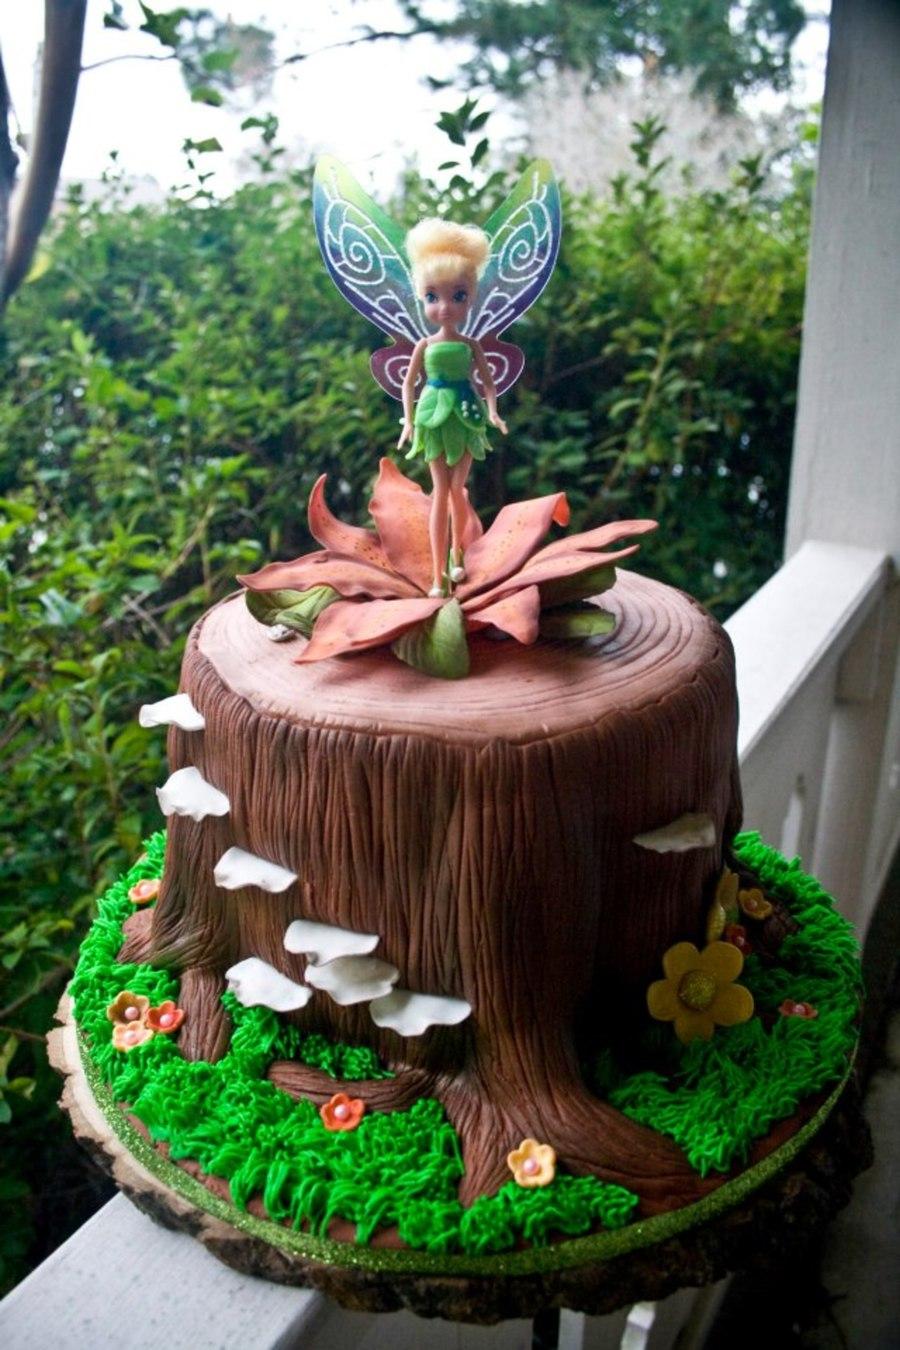 Tinkerbell On A Tree Stump Chocolate Cake With Vanilla